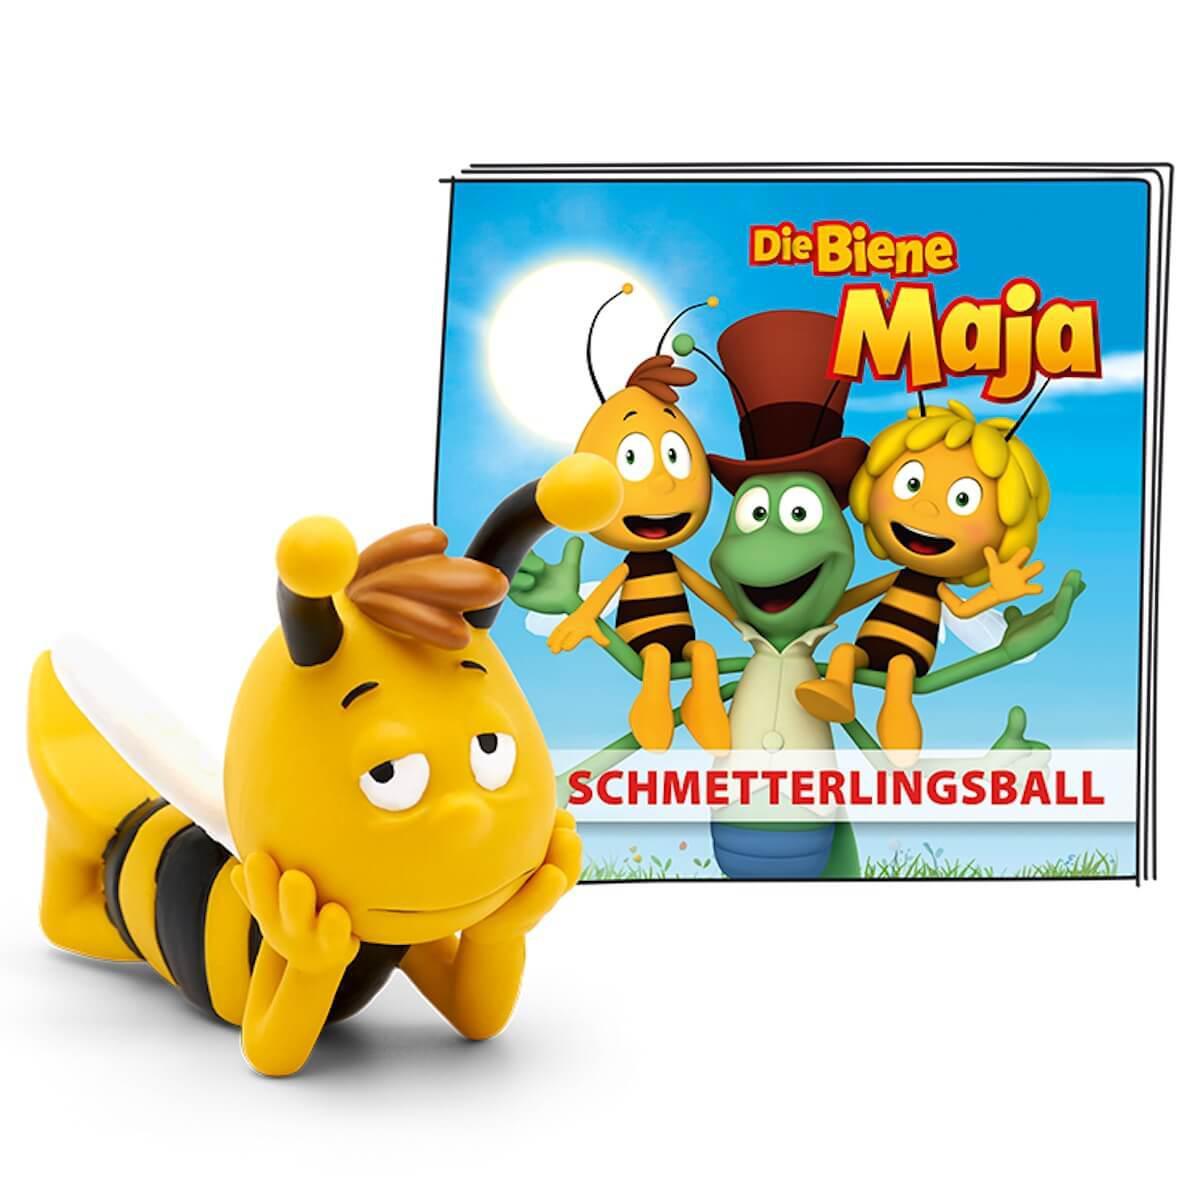 Hörspielfigur TONIES Biene Maja Der Schmetterlingsball